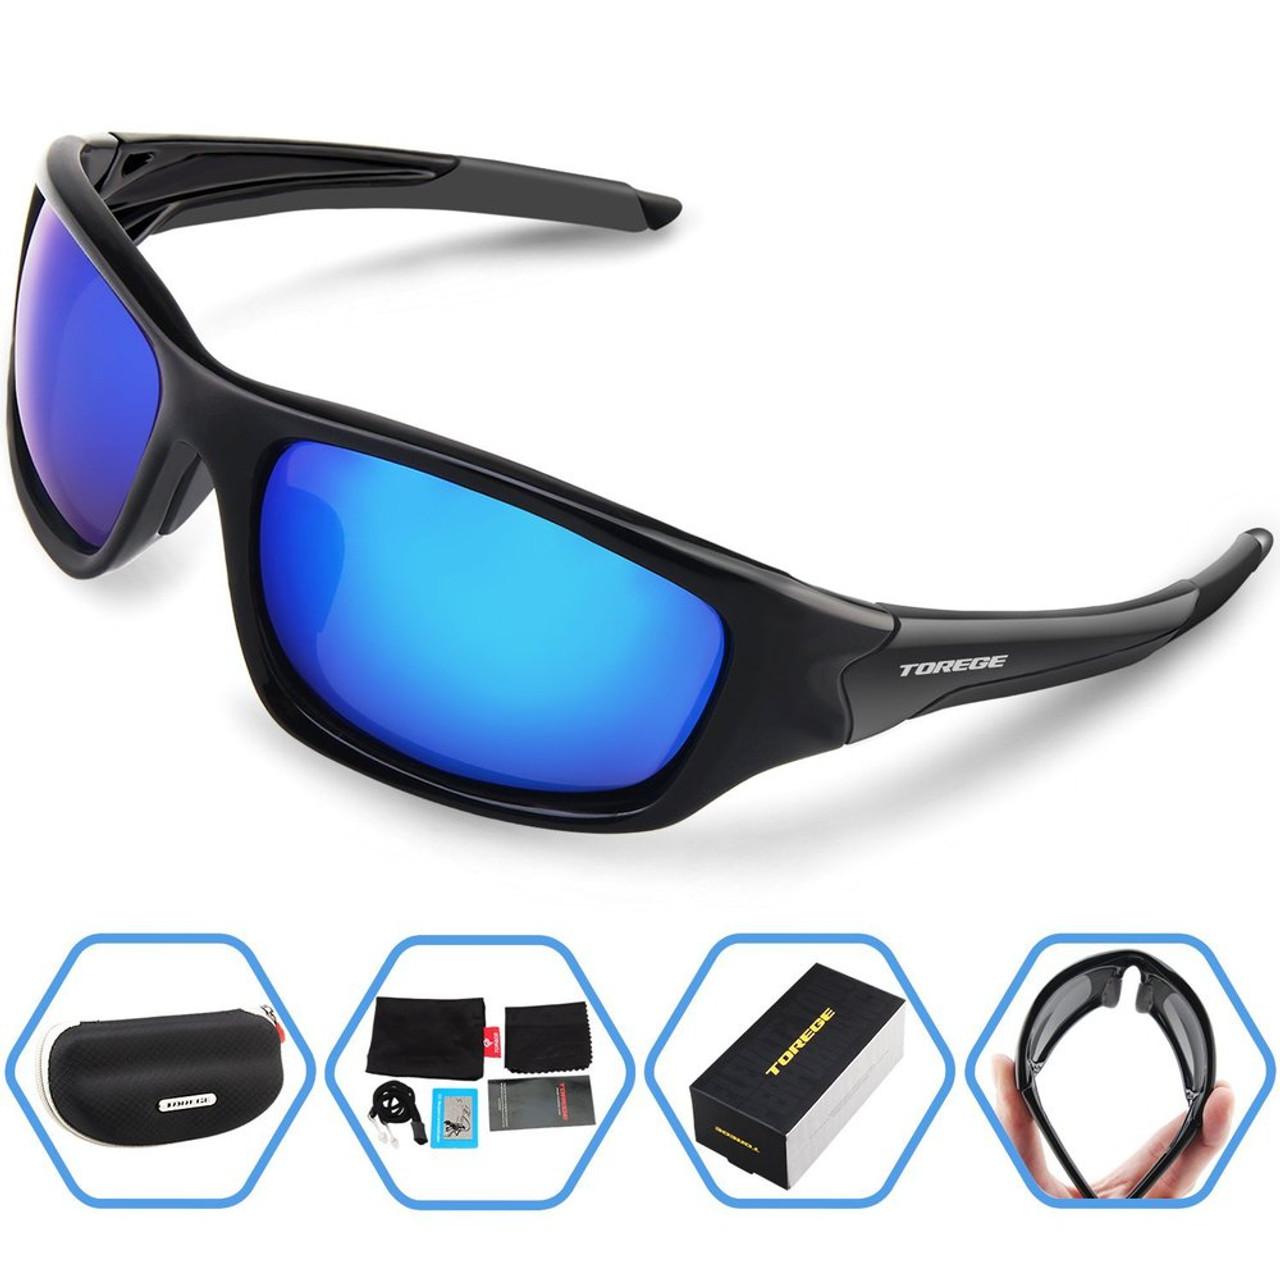 48a49fef83 Torege mens fashion polarized sunglasses for driving glasses unbreakable  frame eyewear unisex jpg 1000x1000 Blue gradient